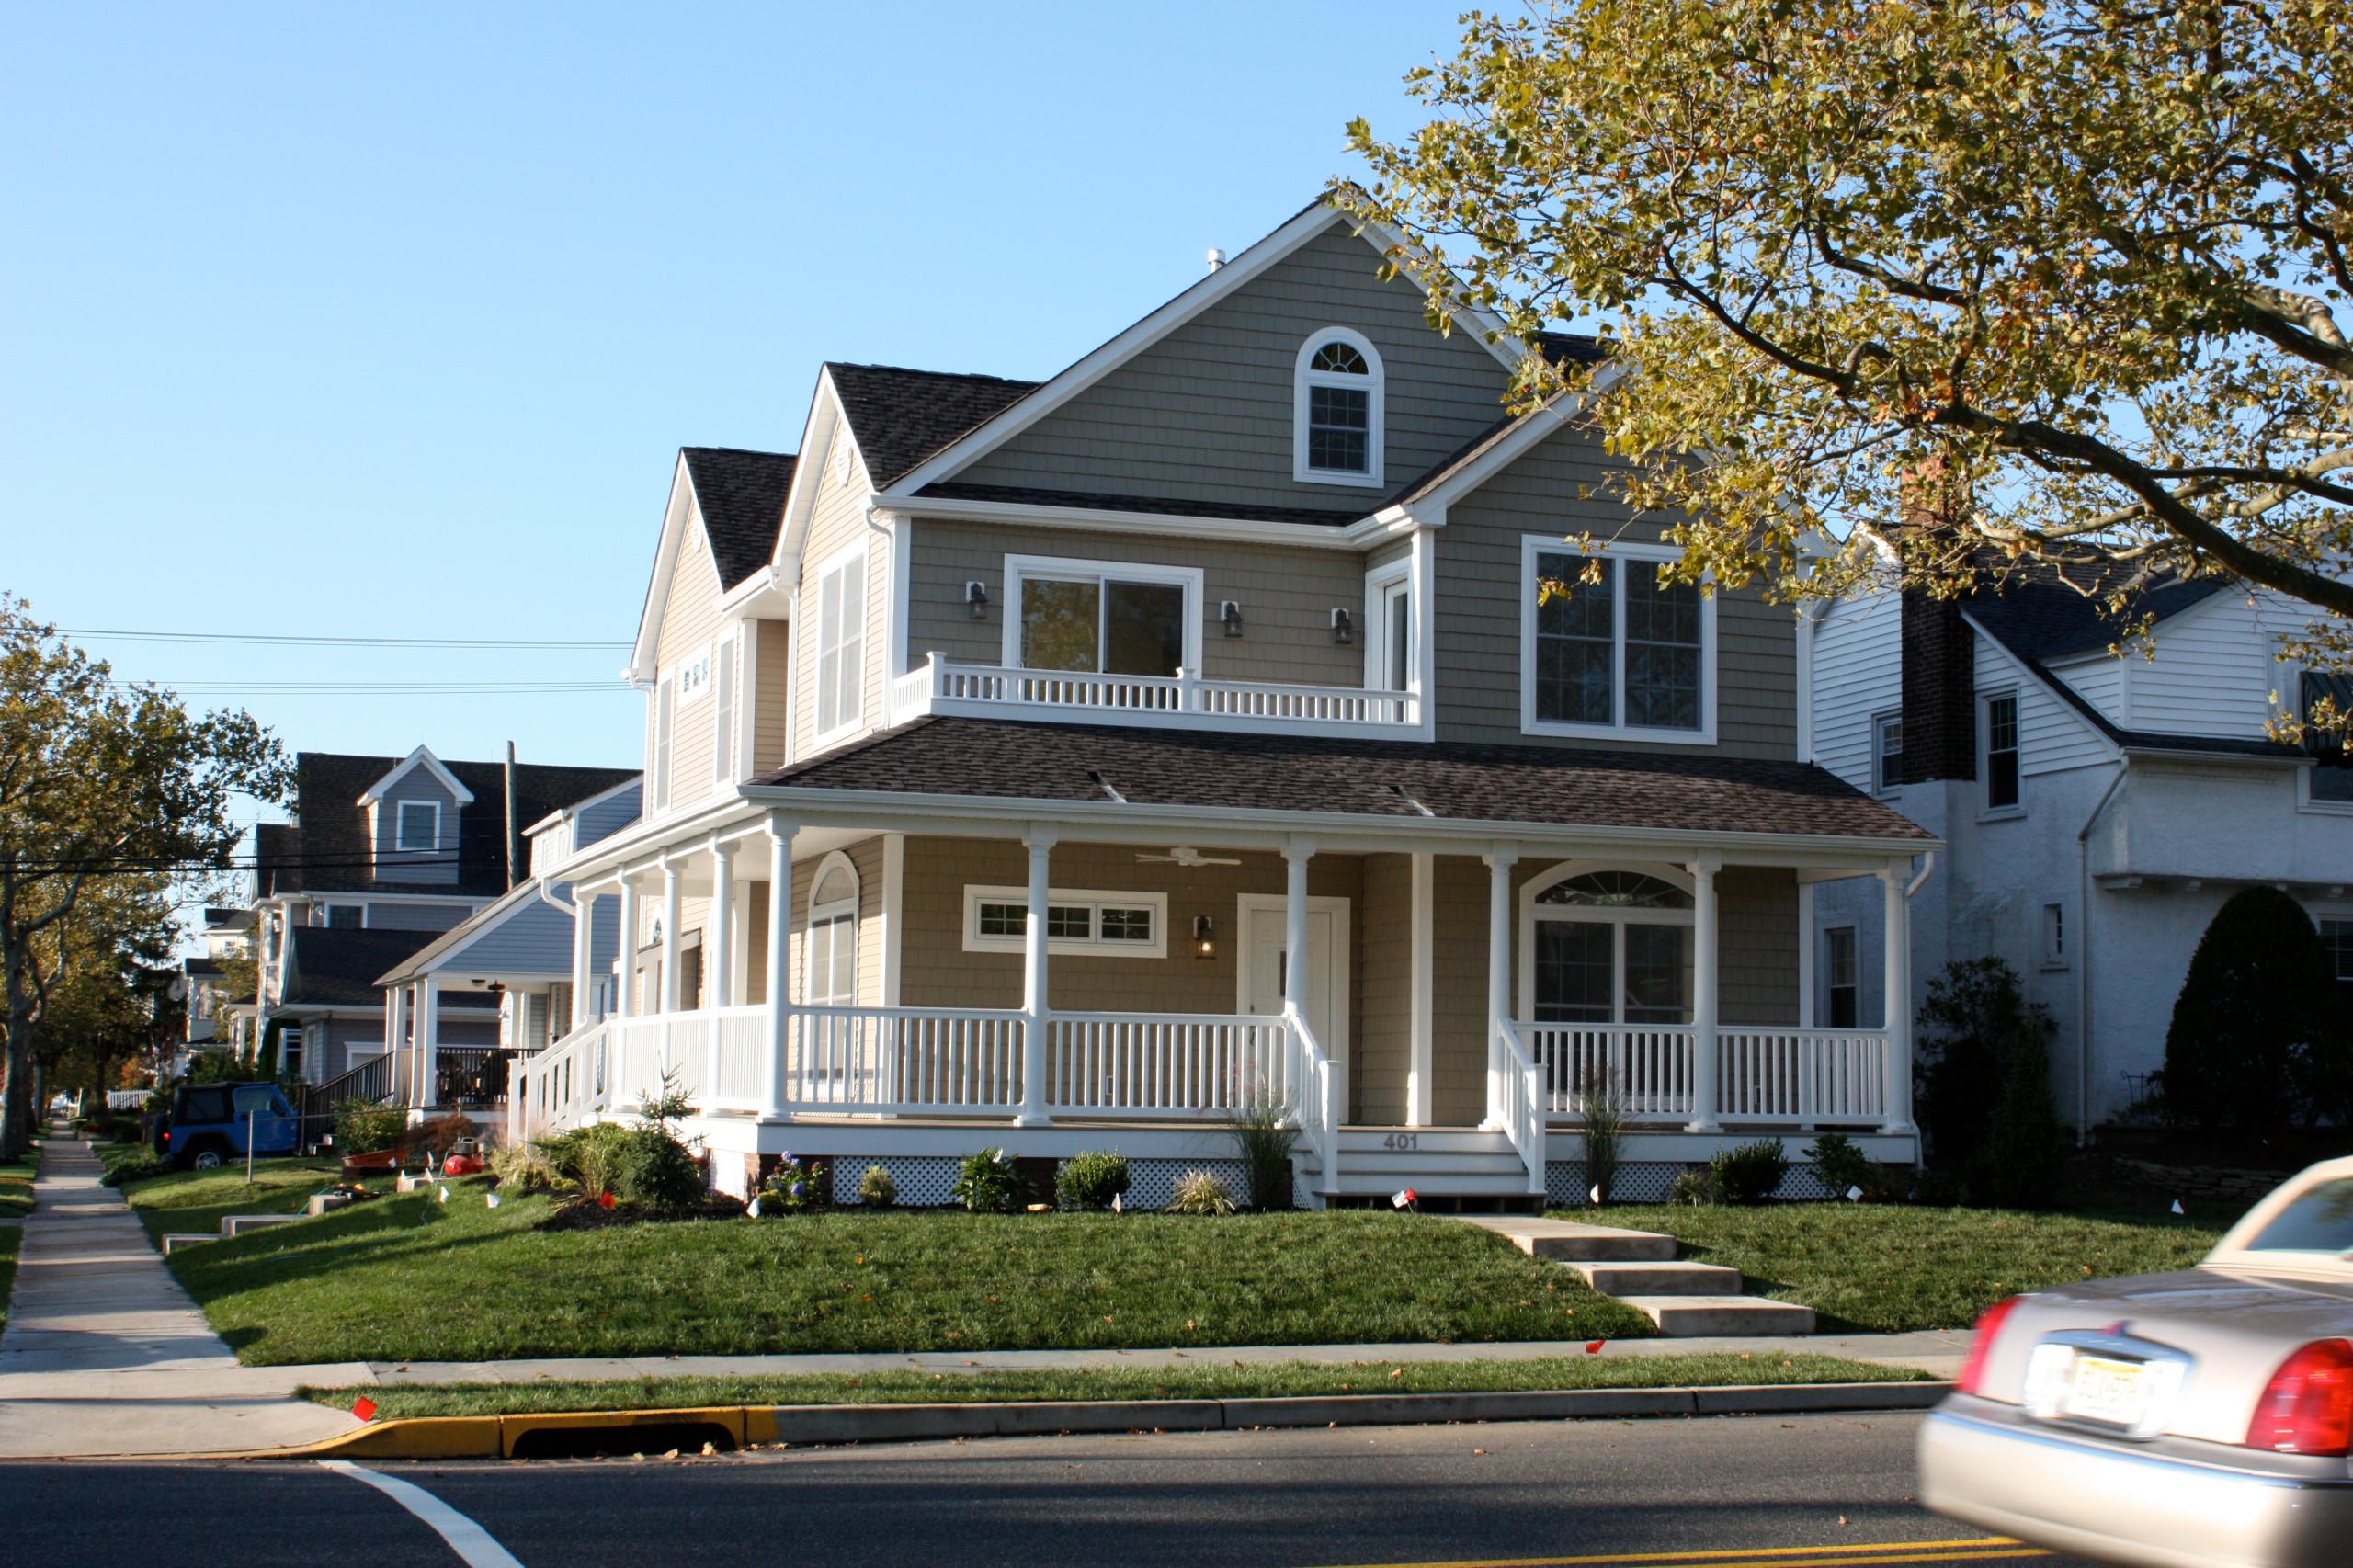 Avon by the Sea, Sylvania Ave